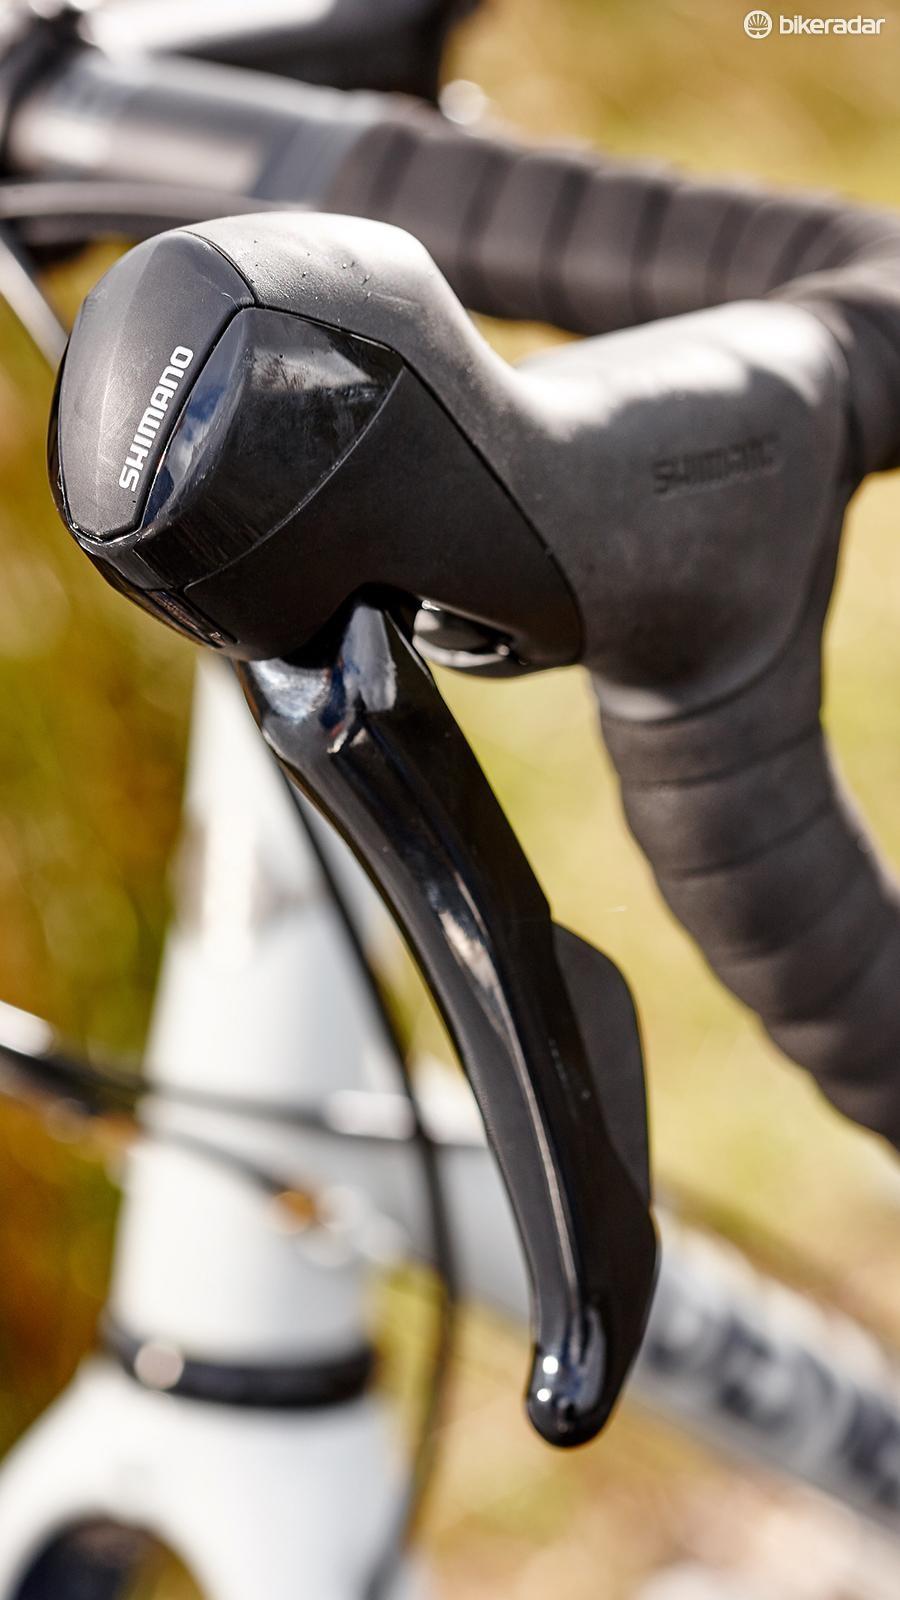 5b14d5d4269 Genesis Fugio Robert Smith. The shape of the Shimano 505 brake hoods won't  suit everyone